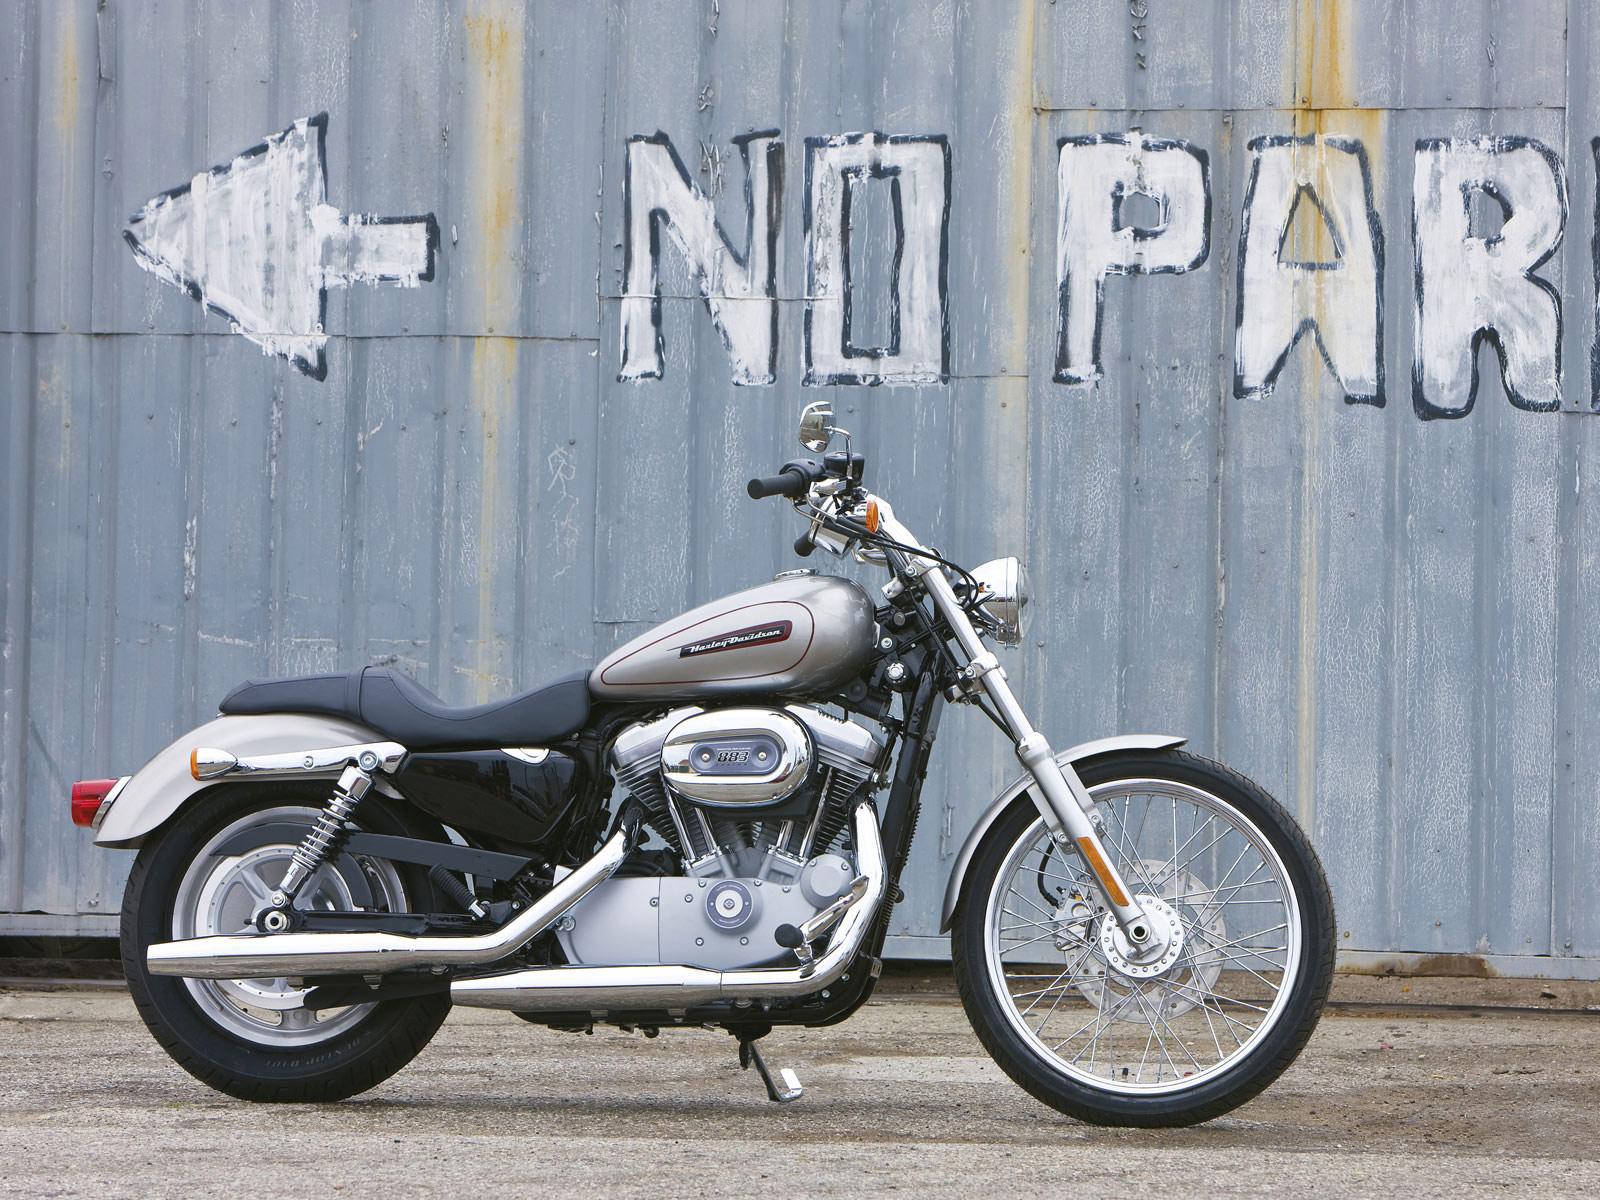 Harley Davidson: 2009 XL883C Sportster 833 Custom Accident Lawyers Info